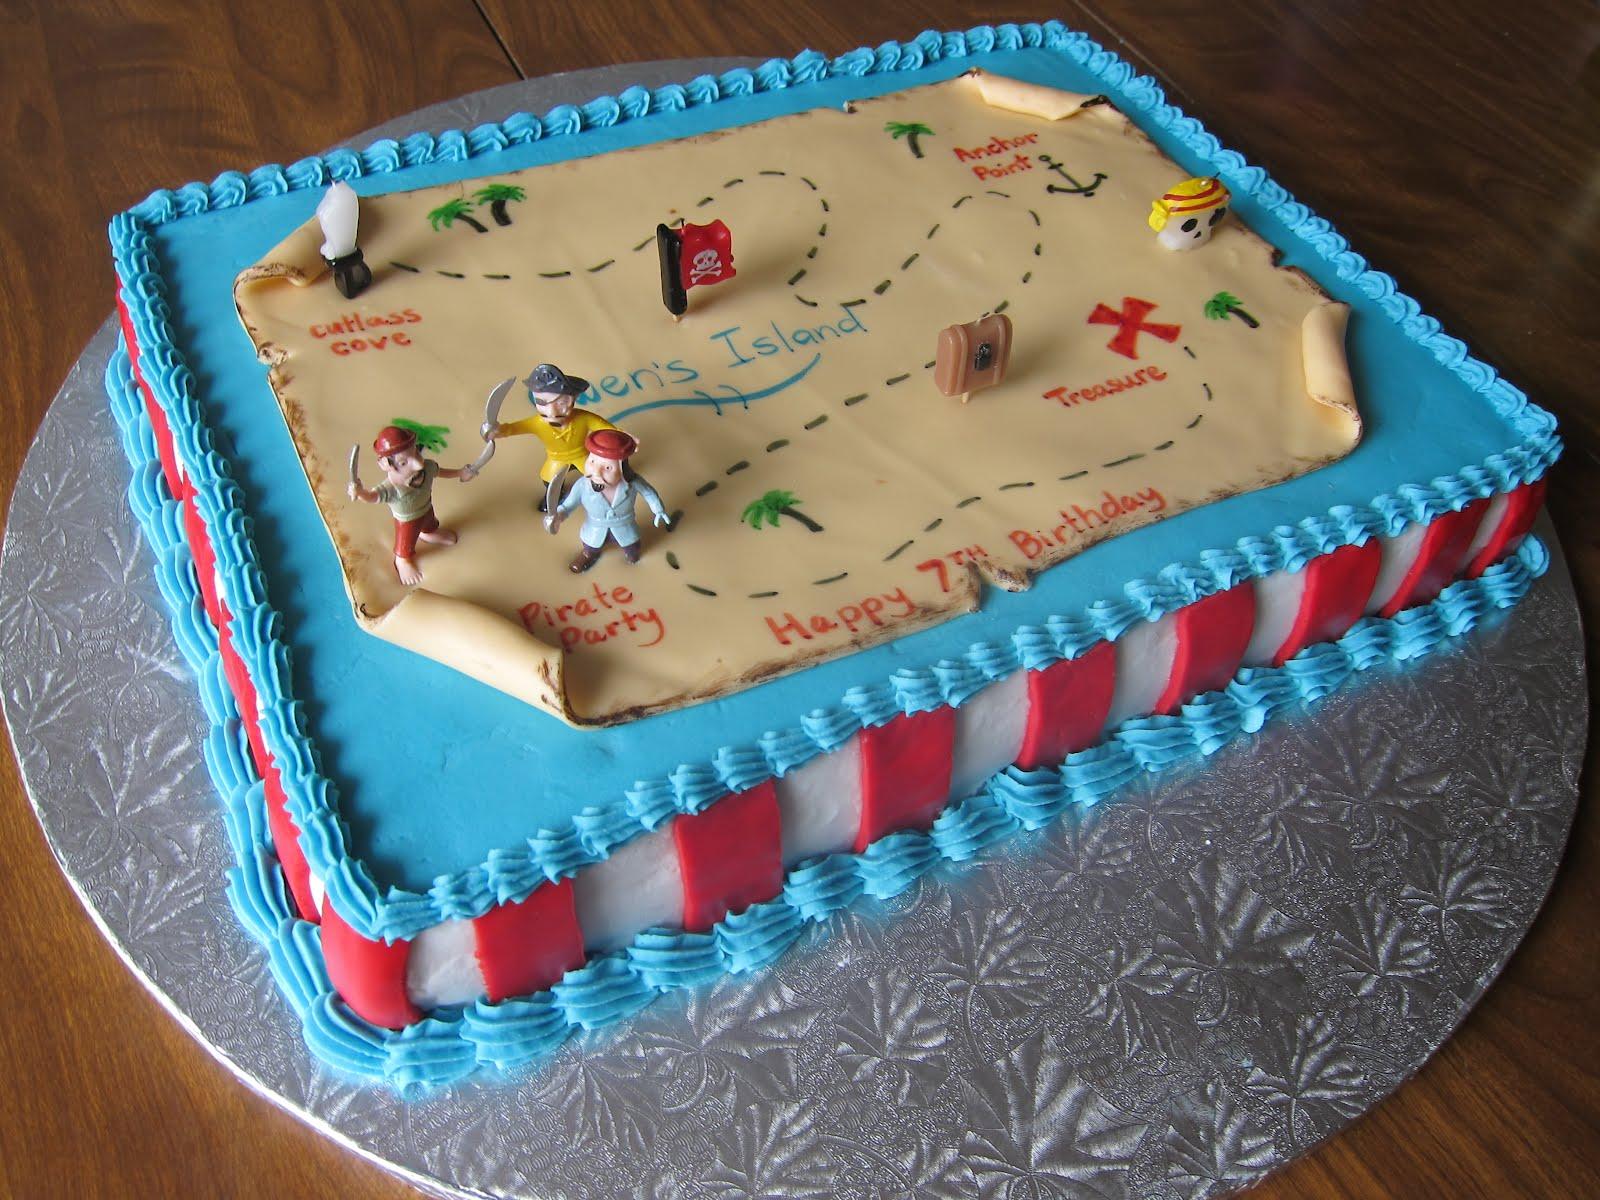 Pirate Map Cake